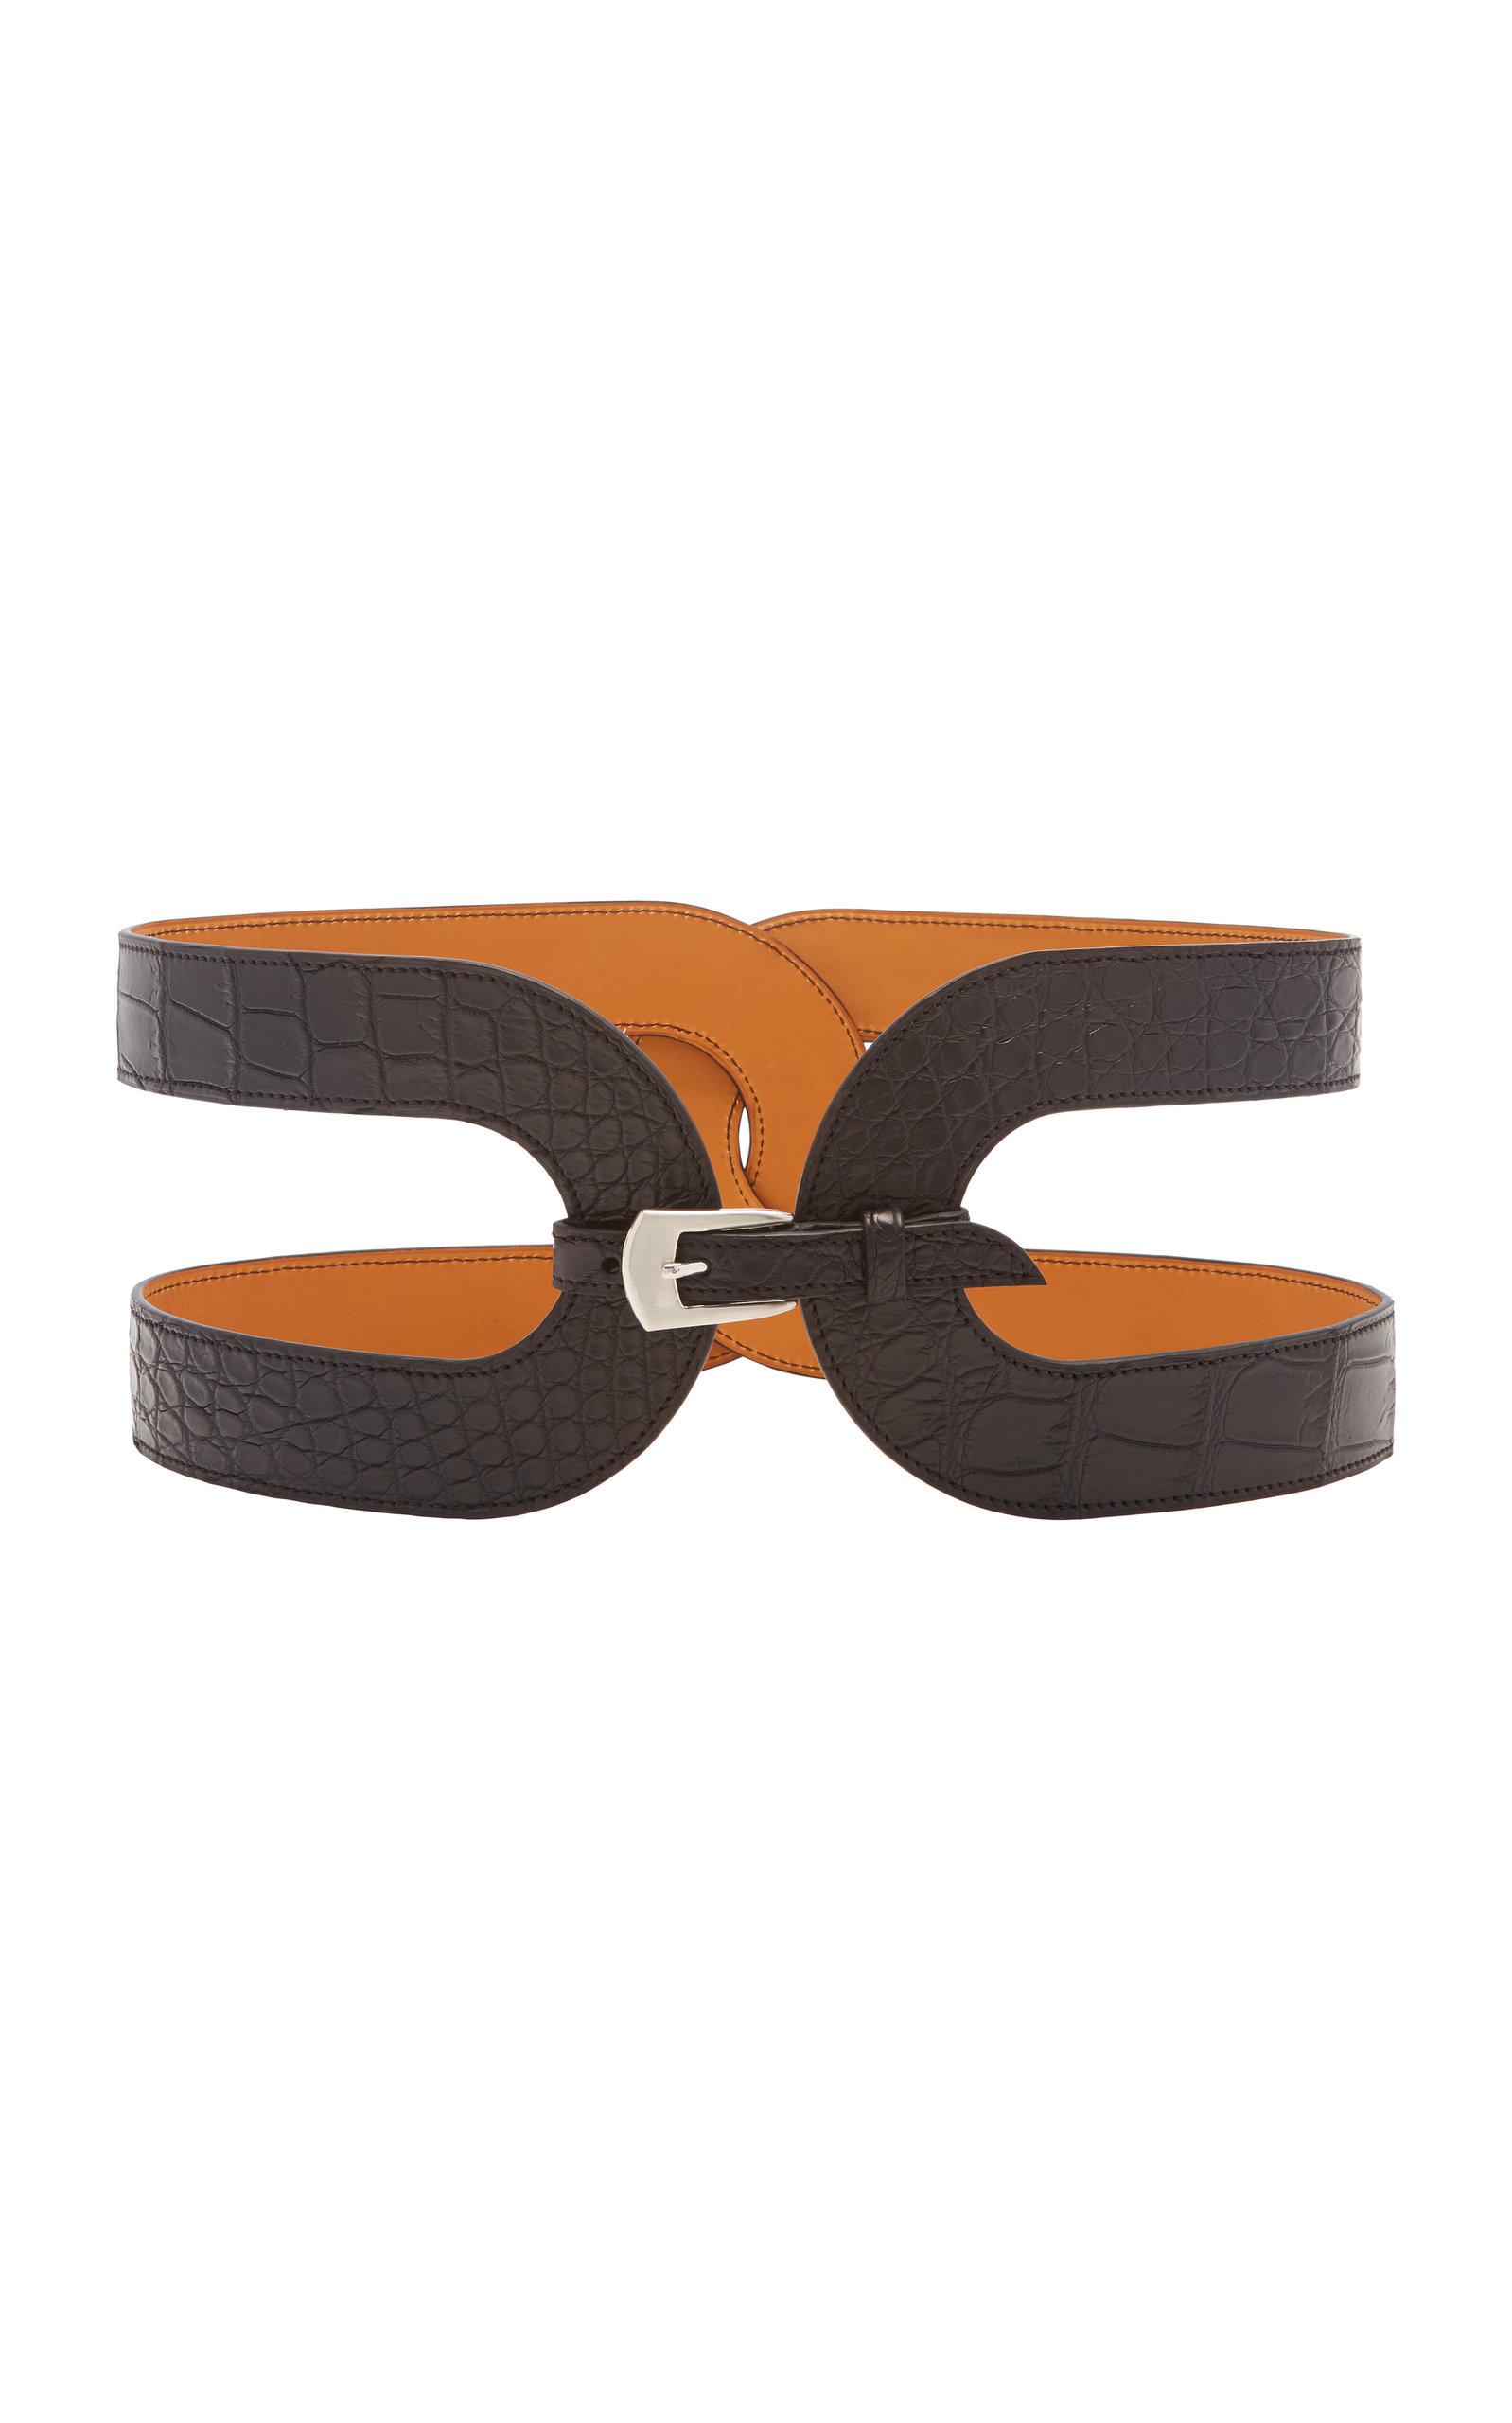 Women's Exclusive Crocodile Waist Belt